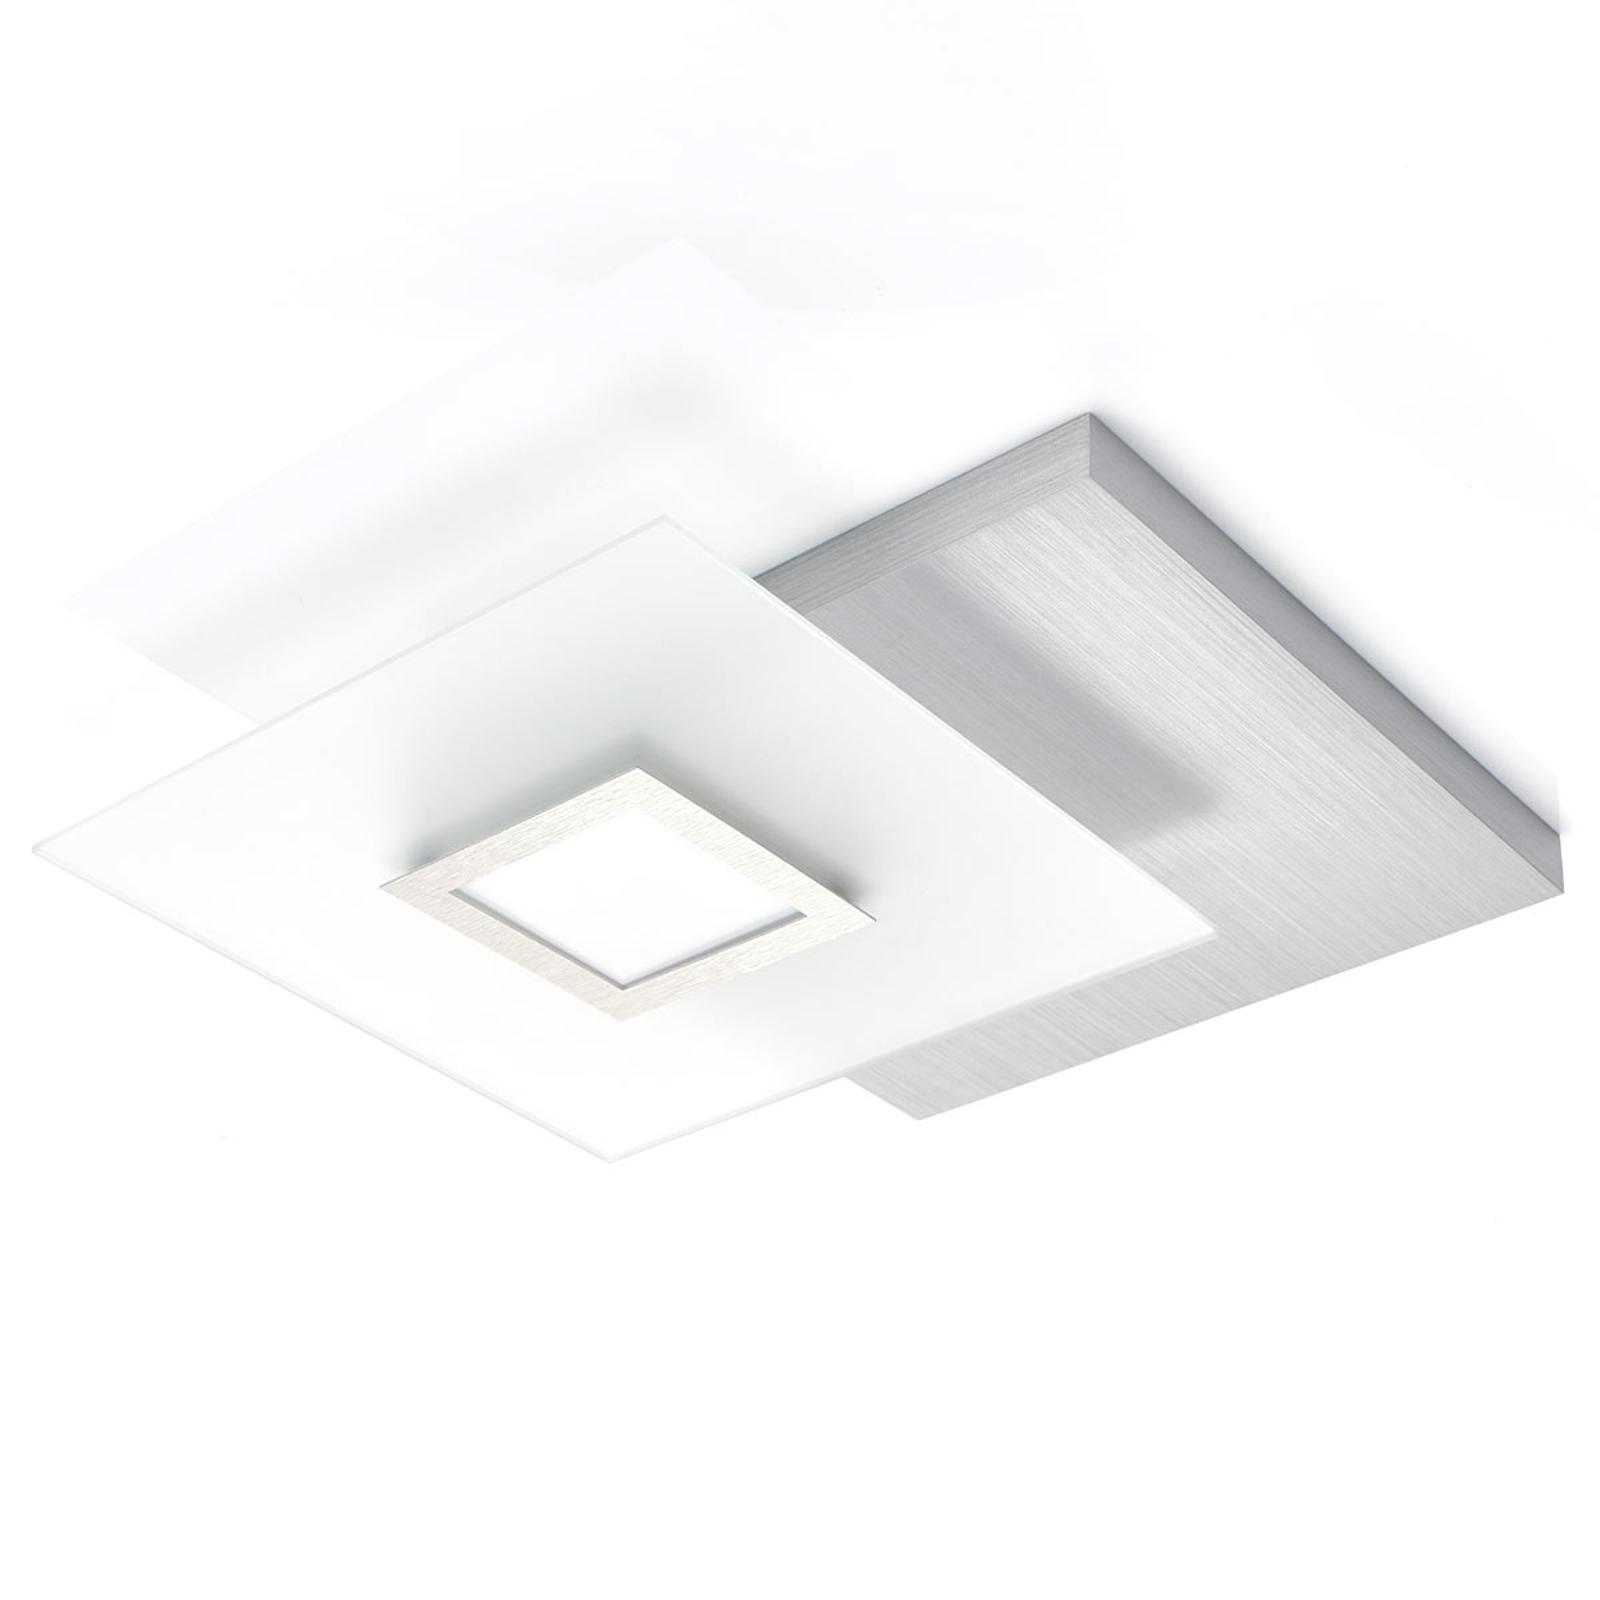 Iögonfallande LED-taklampa Flat, dimbar